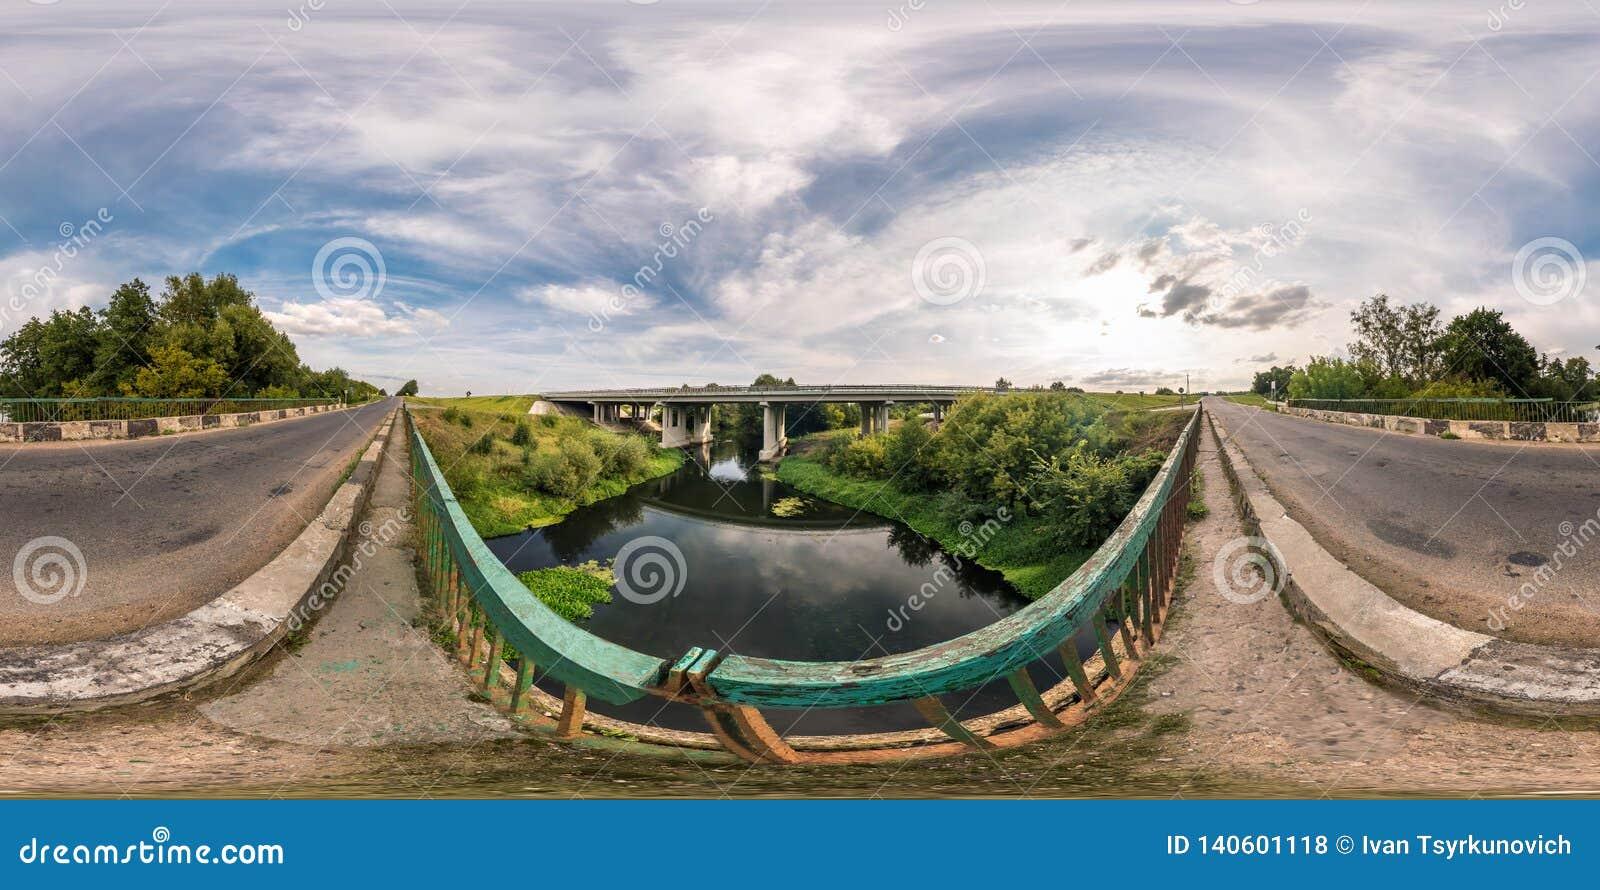 Full Seamless Spherical Panorama 360 By 180 Angle View Near Big Huge